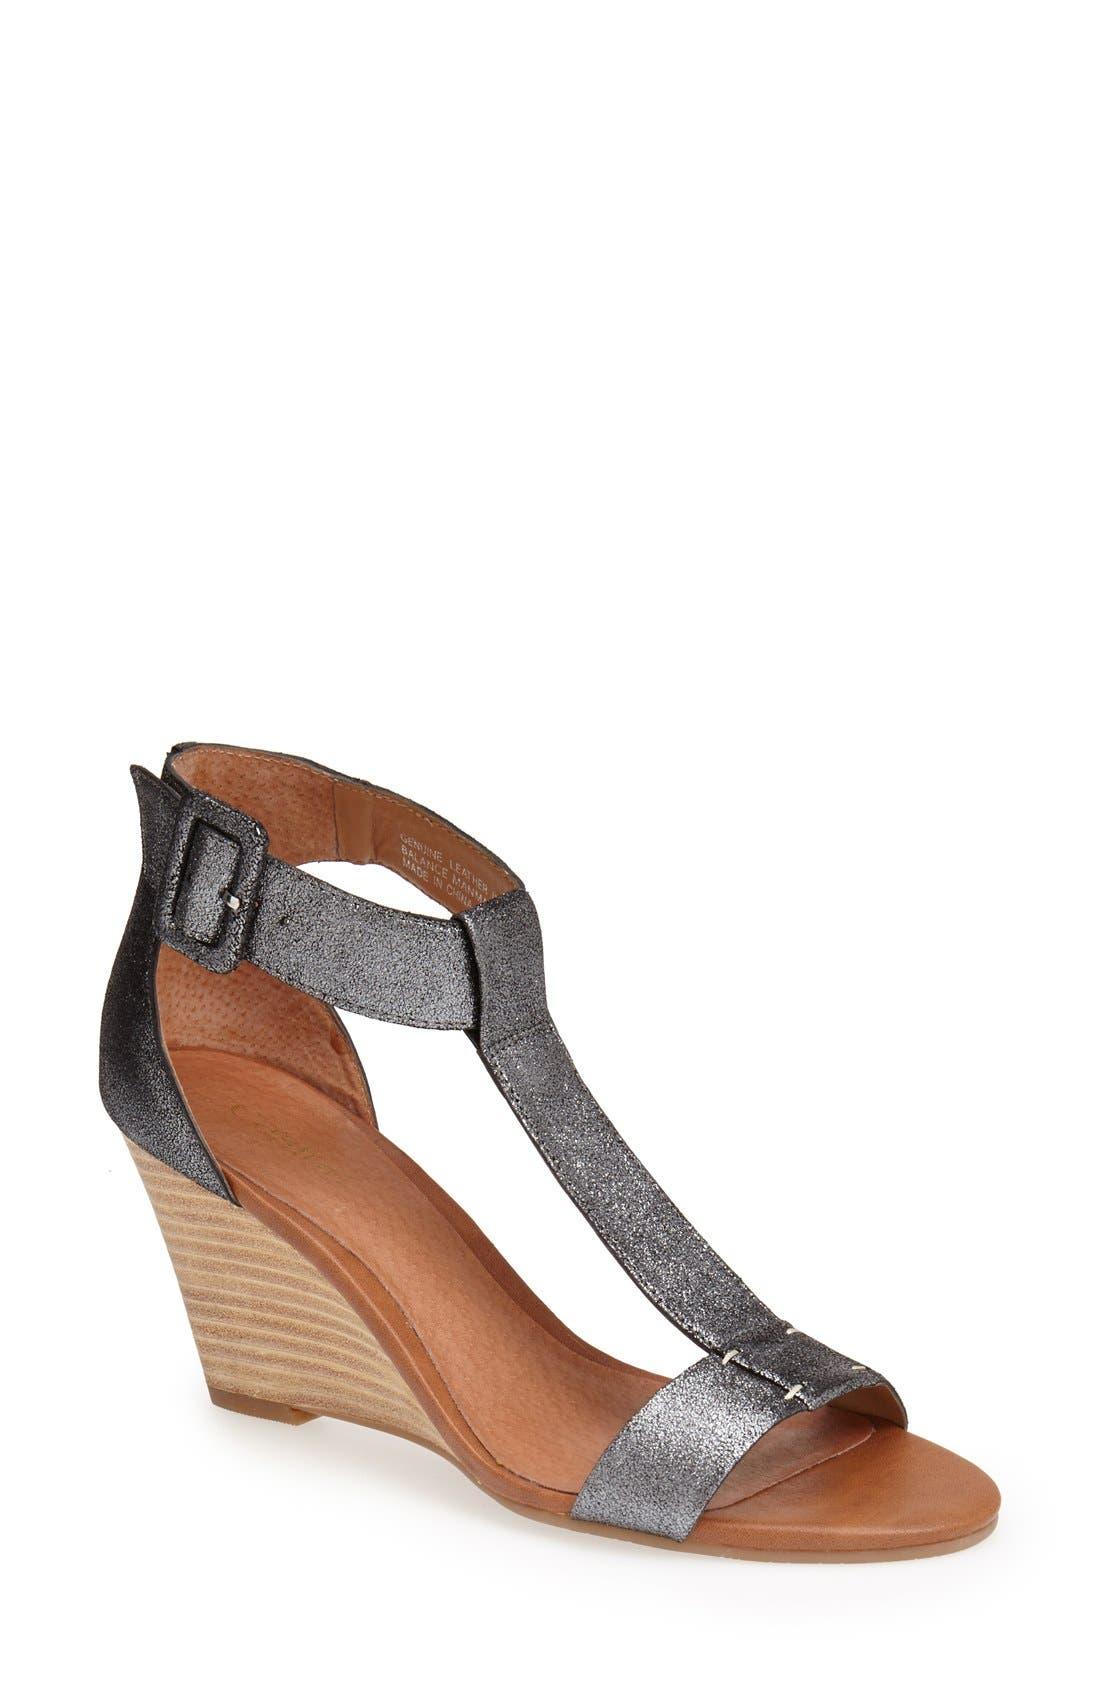 Alternate Image 1 Selected - Caslon® 'Ramona' T-Strap Wedge Sandal